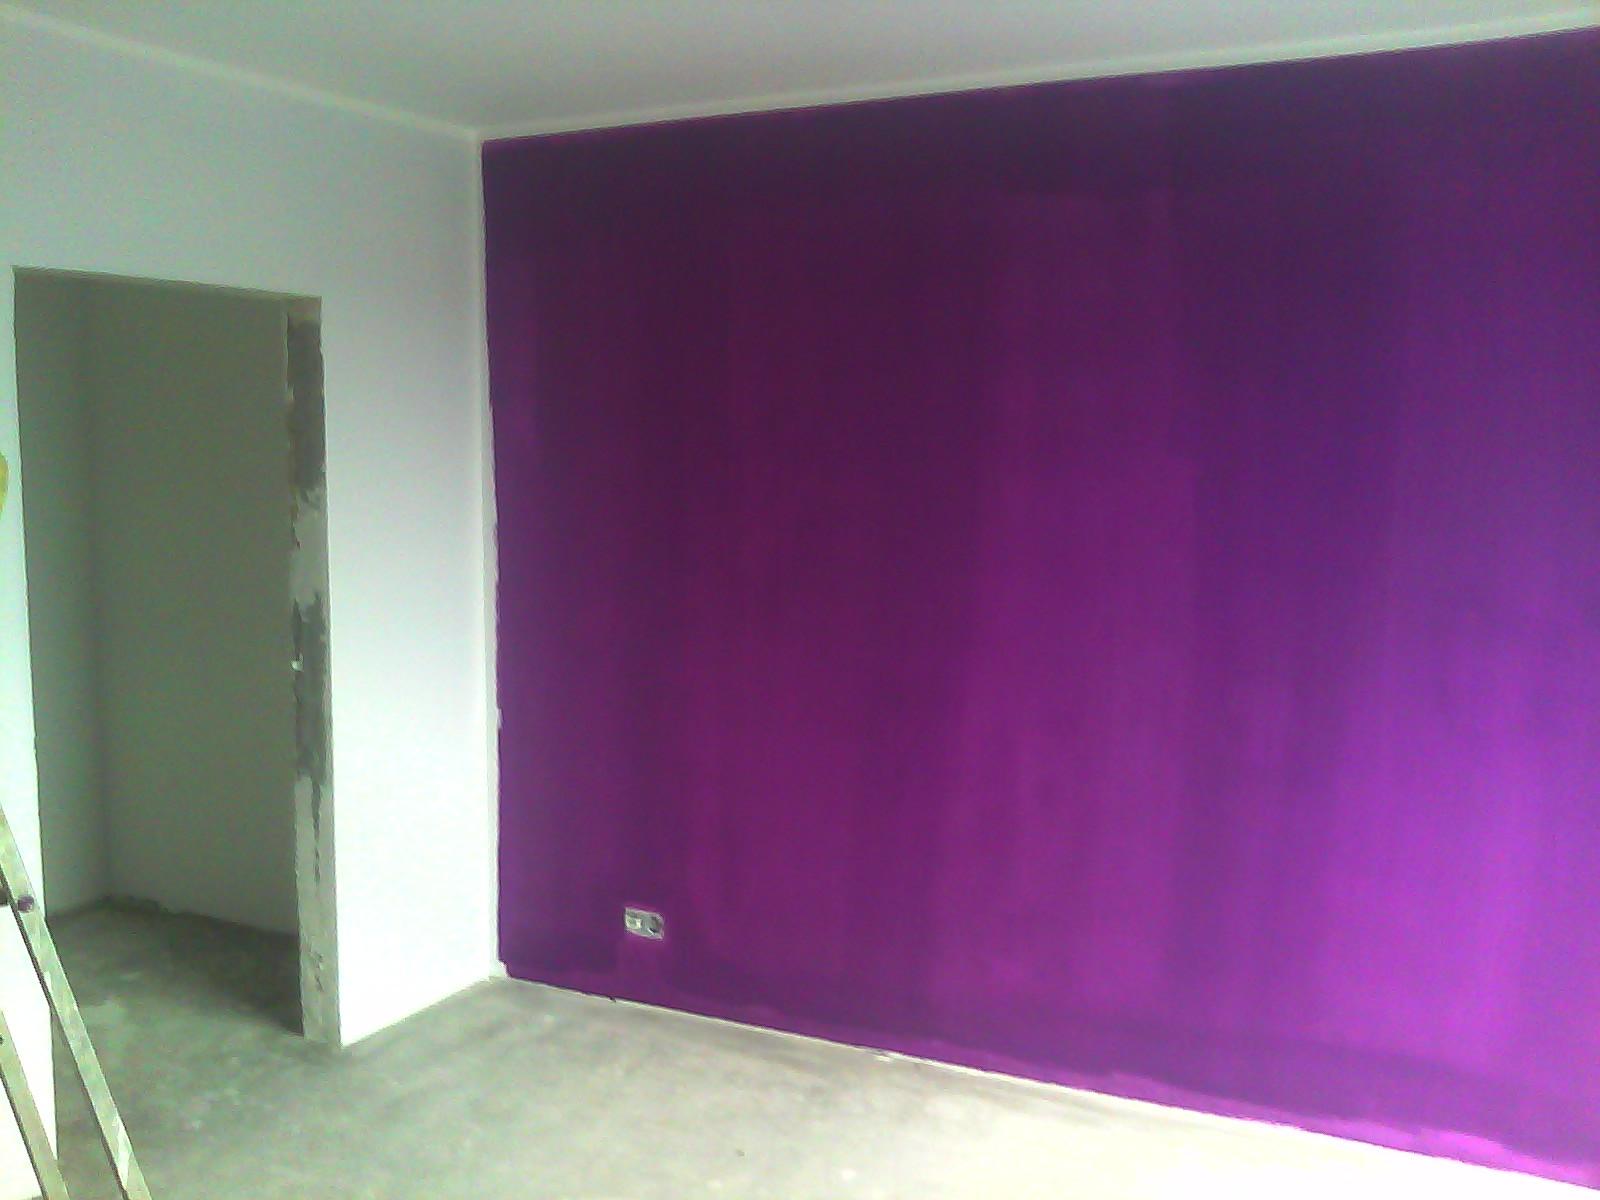 Paarse Slaapkamer Spullen : Paarse accessoires slaapkamer referenties op huis ontwerp